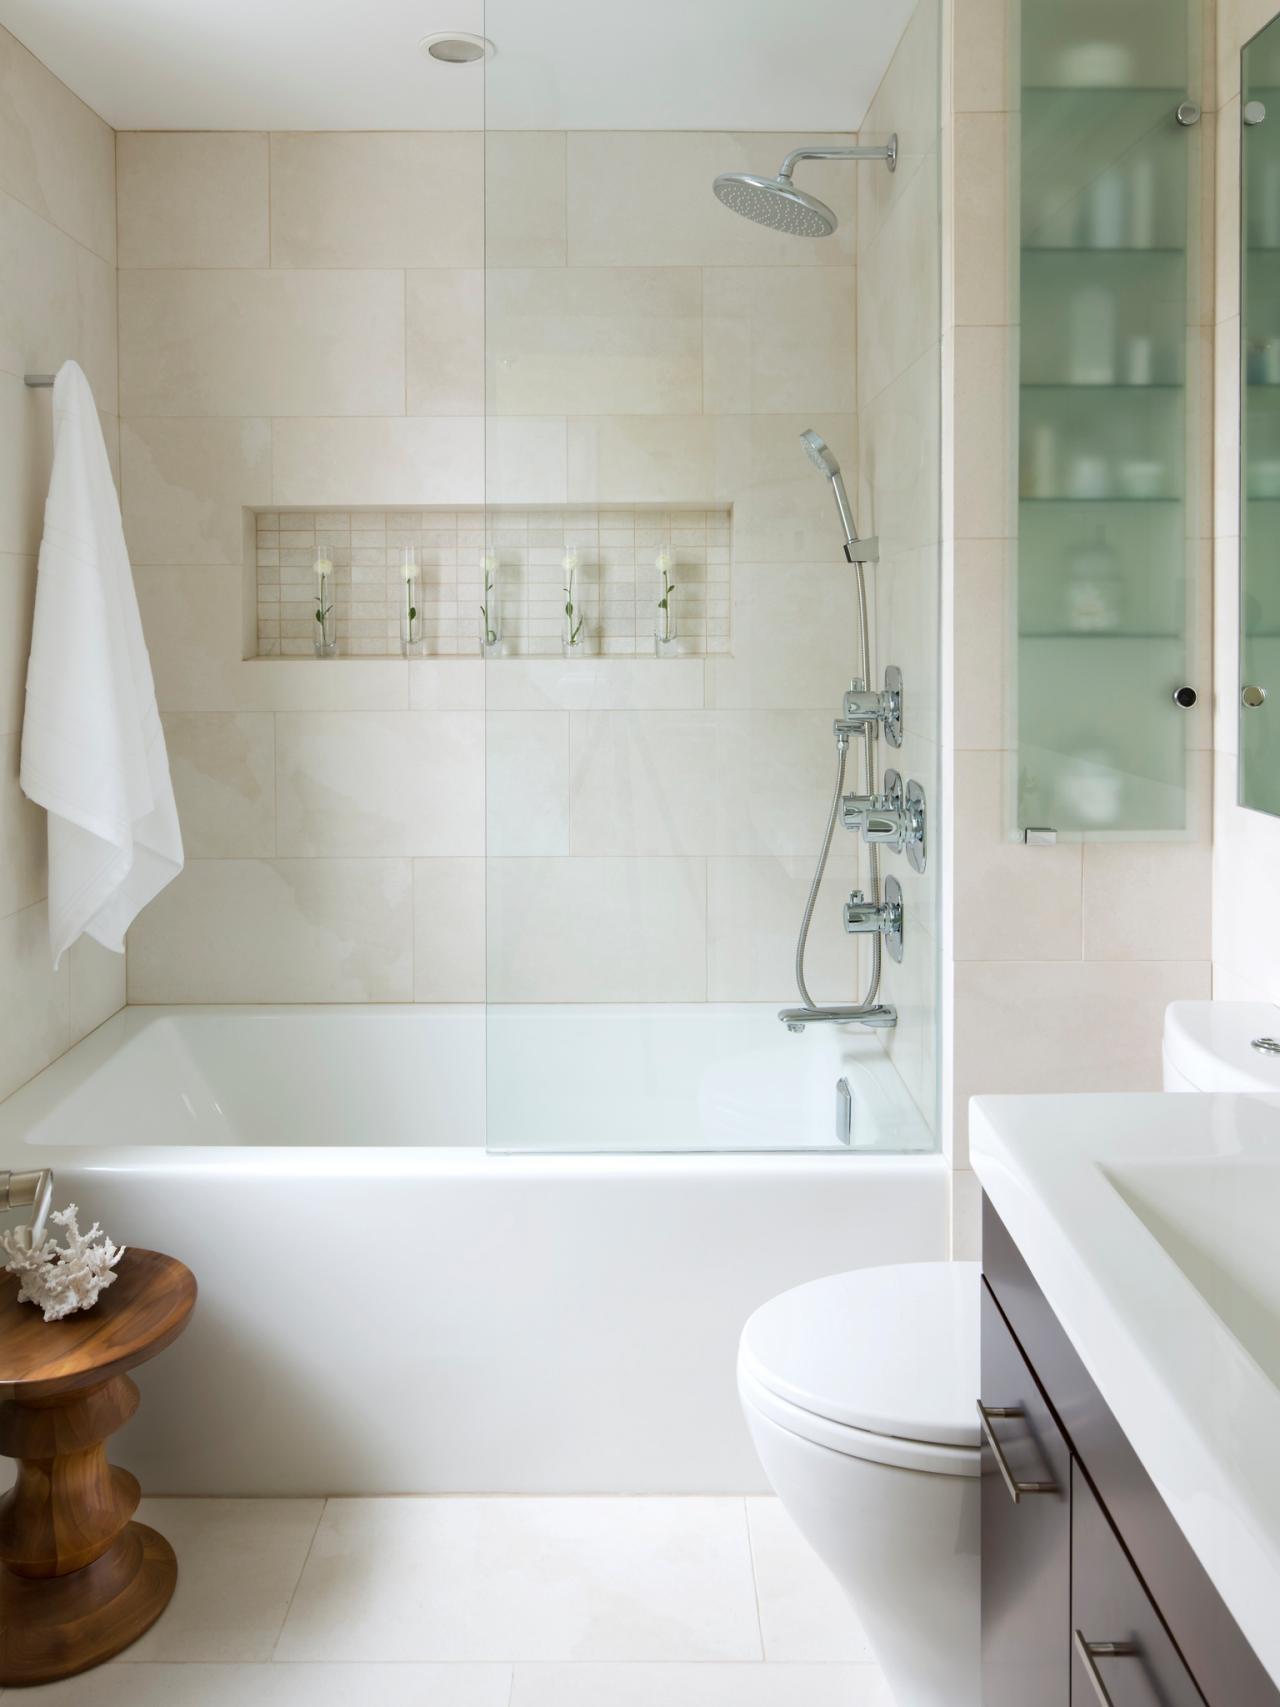 10 Pretty Bathroom Ideas For Small Bathroom %name